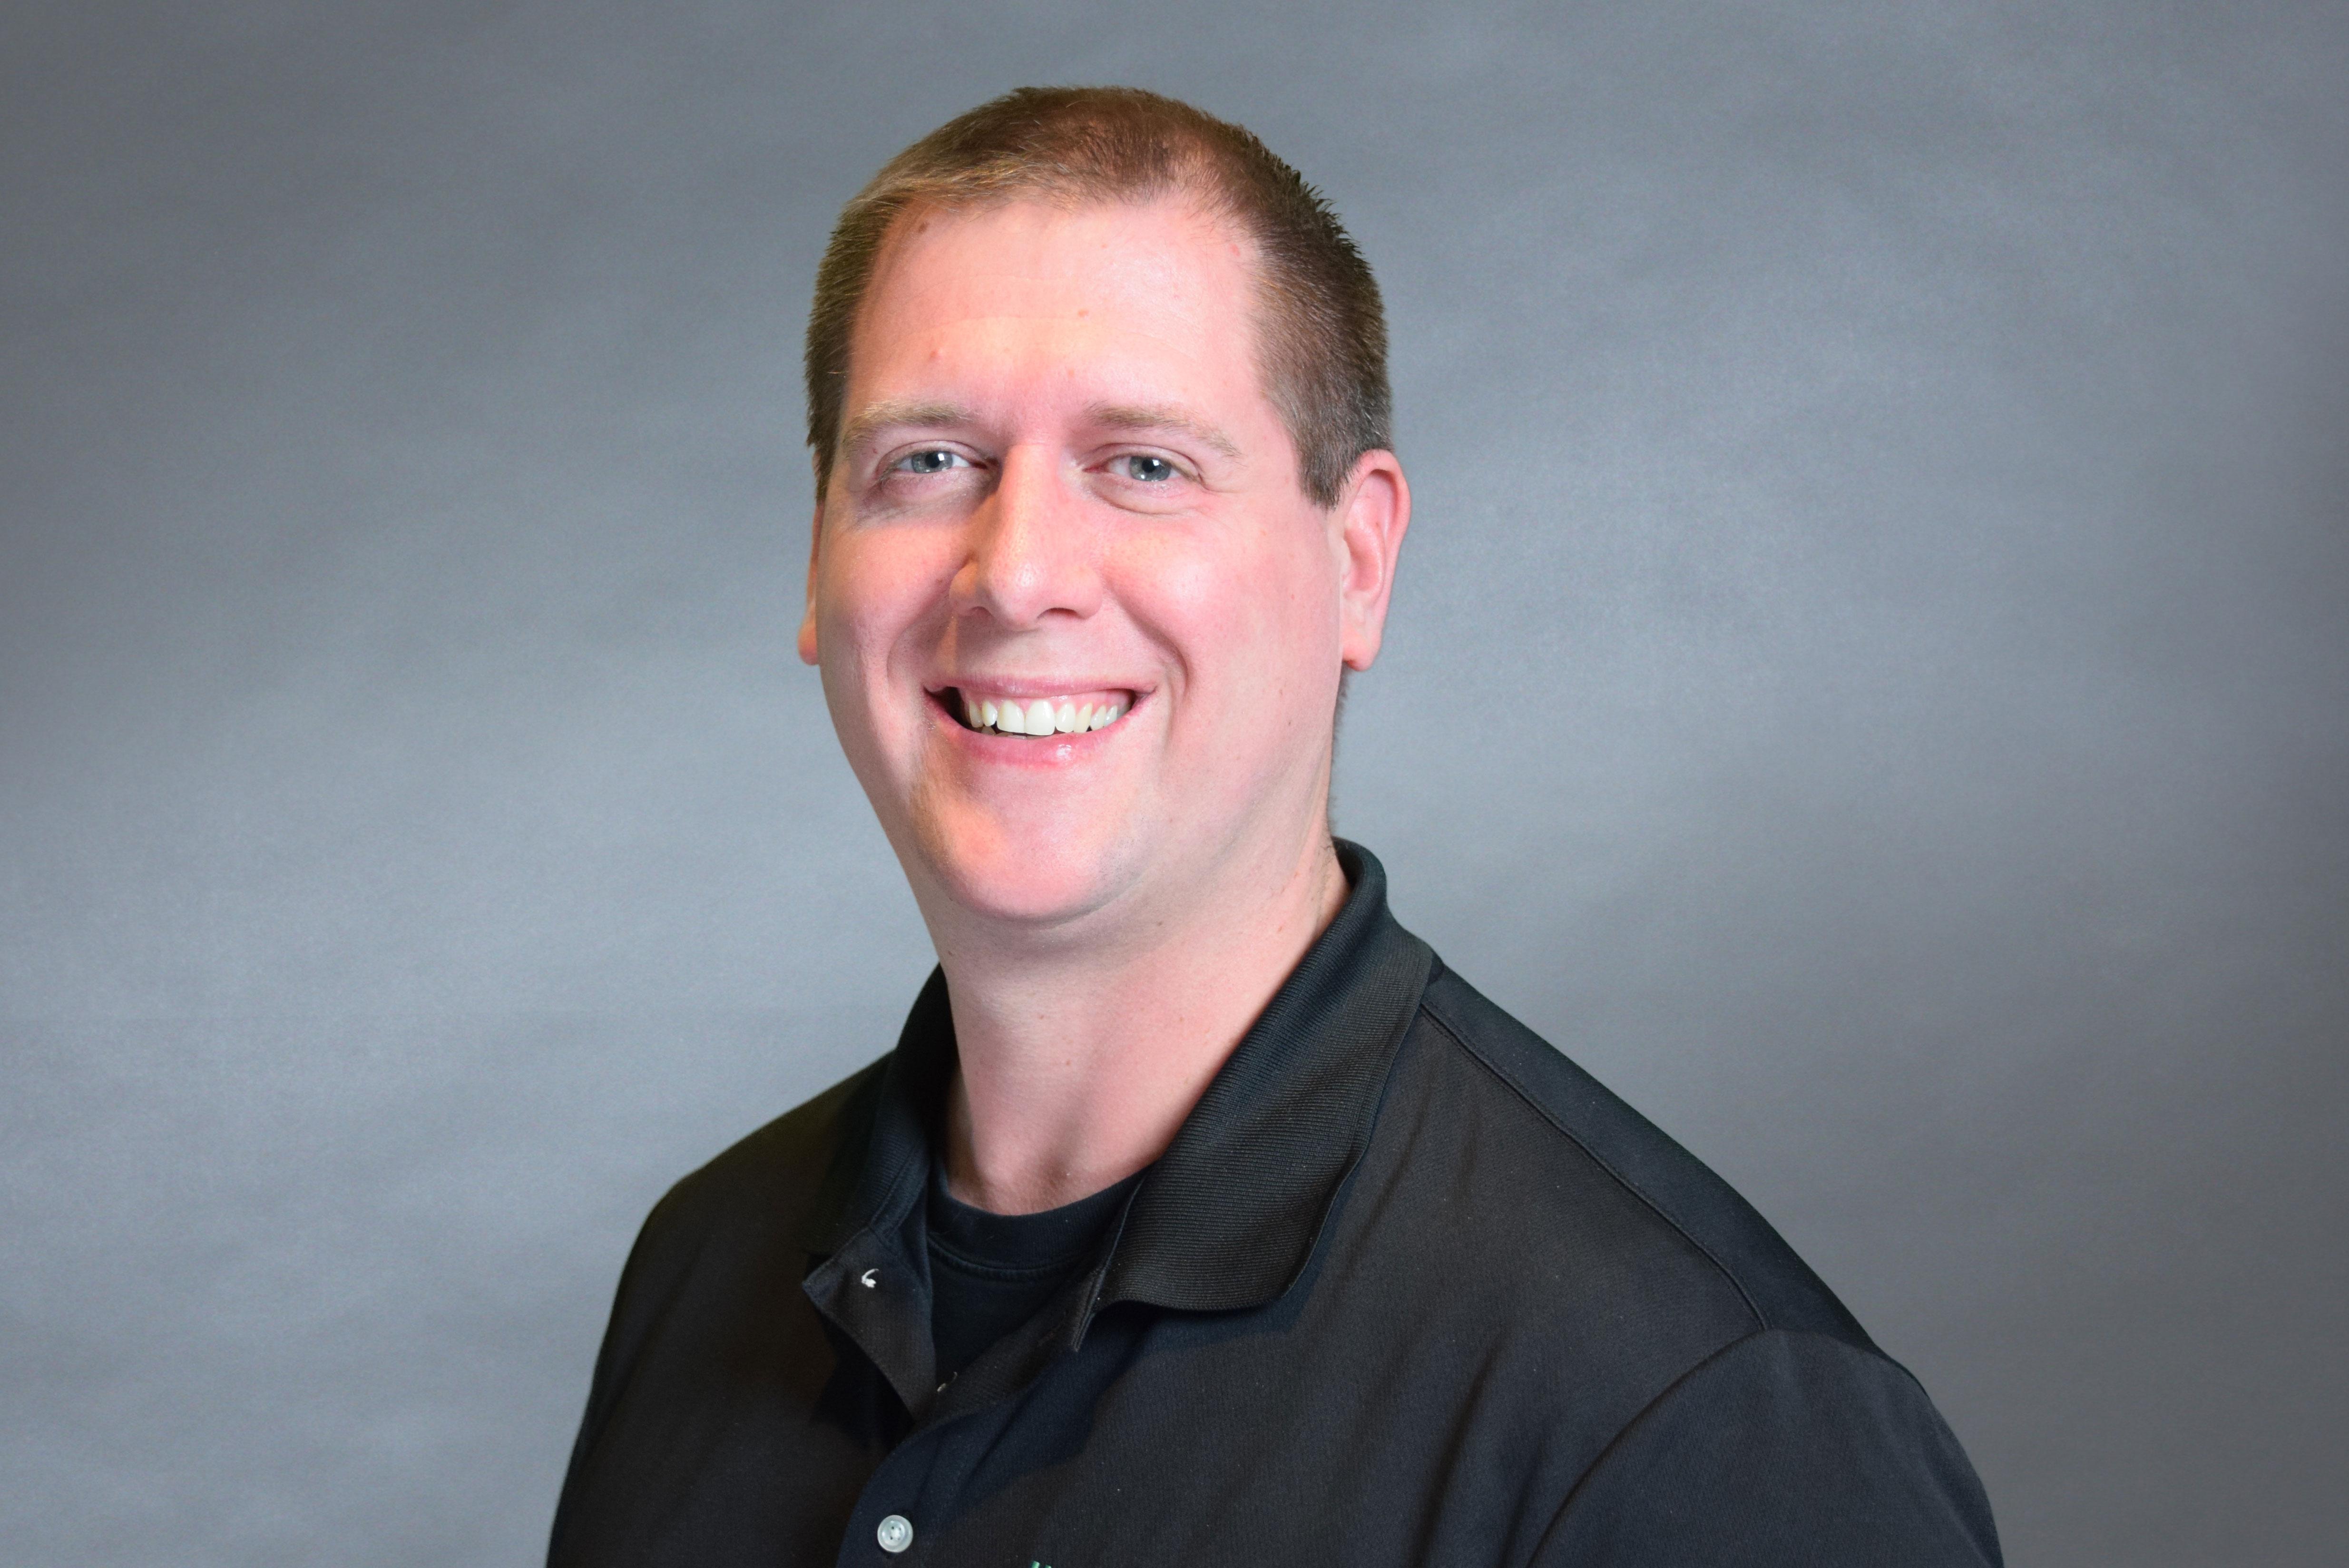 HouseMaster's Brad Horstman Recognized for Achieving Century Club Status